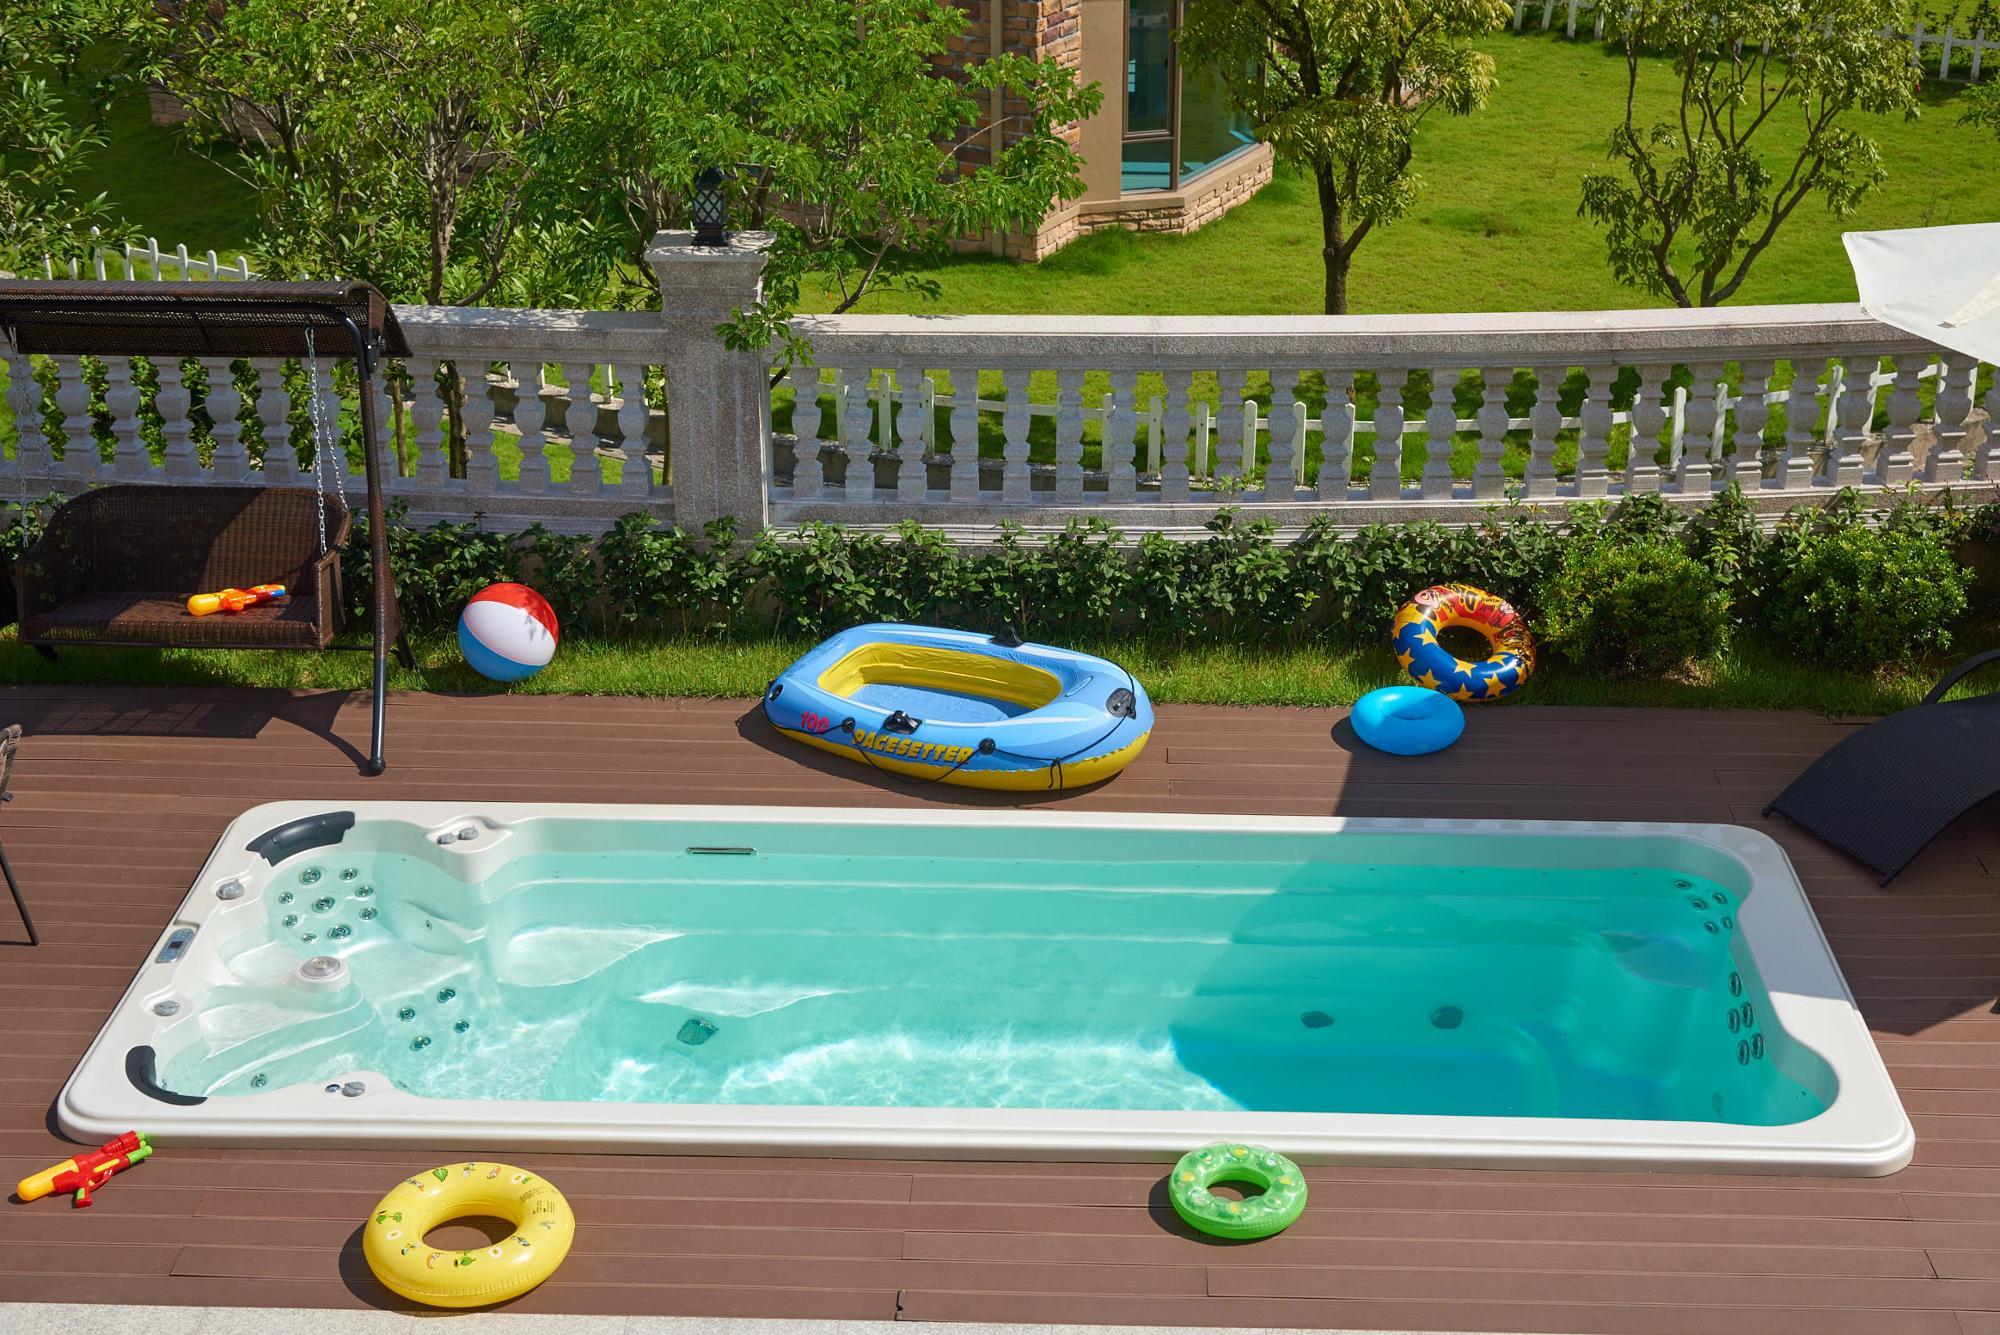 4 Meter Large Swimming Pool Spa Indoor Swimming Pools For Sale (jy 8602) -  Buy Swimming Pool Spa,Outdoor Swimming Pools For Sale,Swim Spa Pool Product  ...